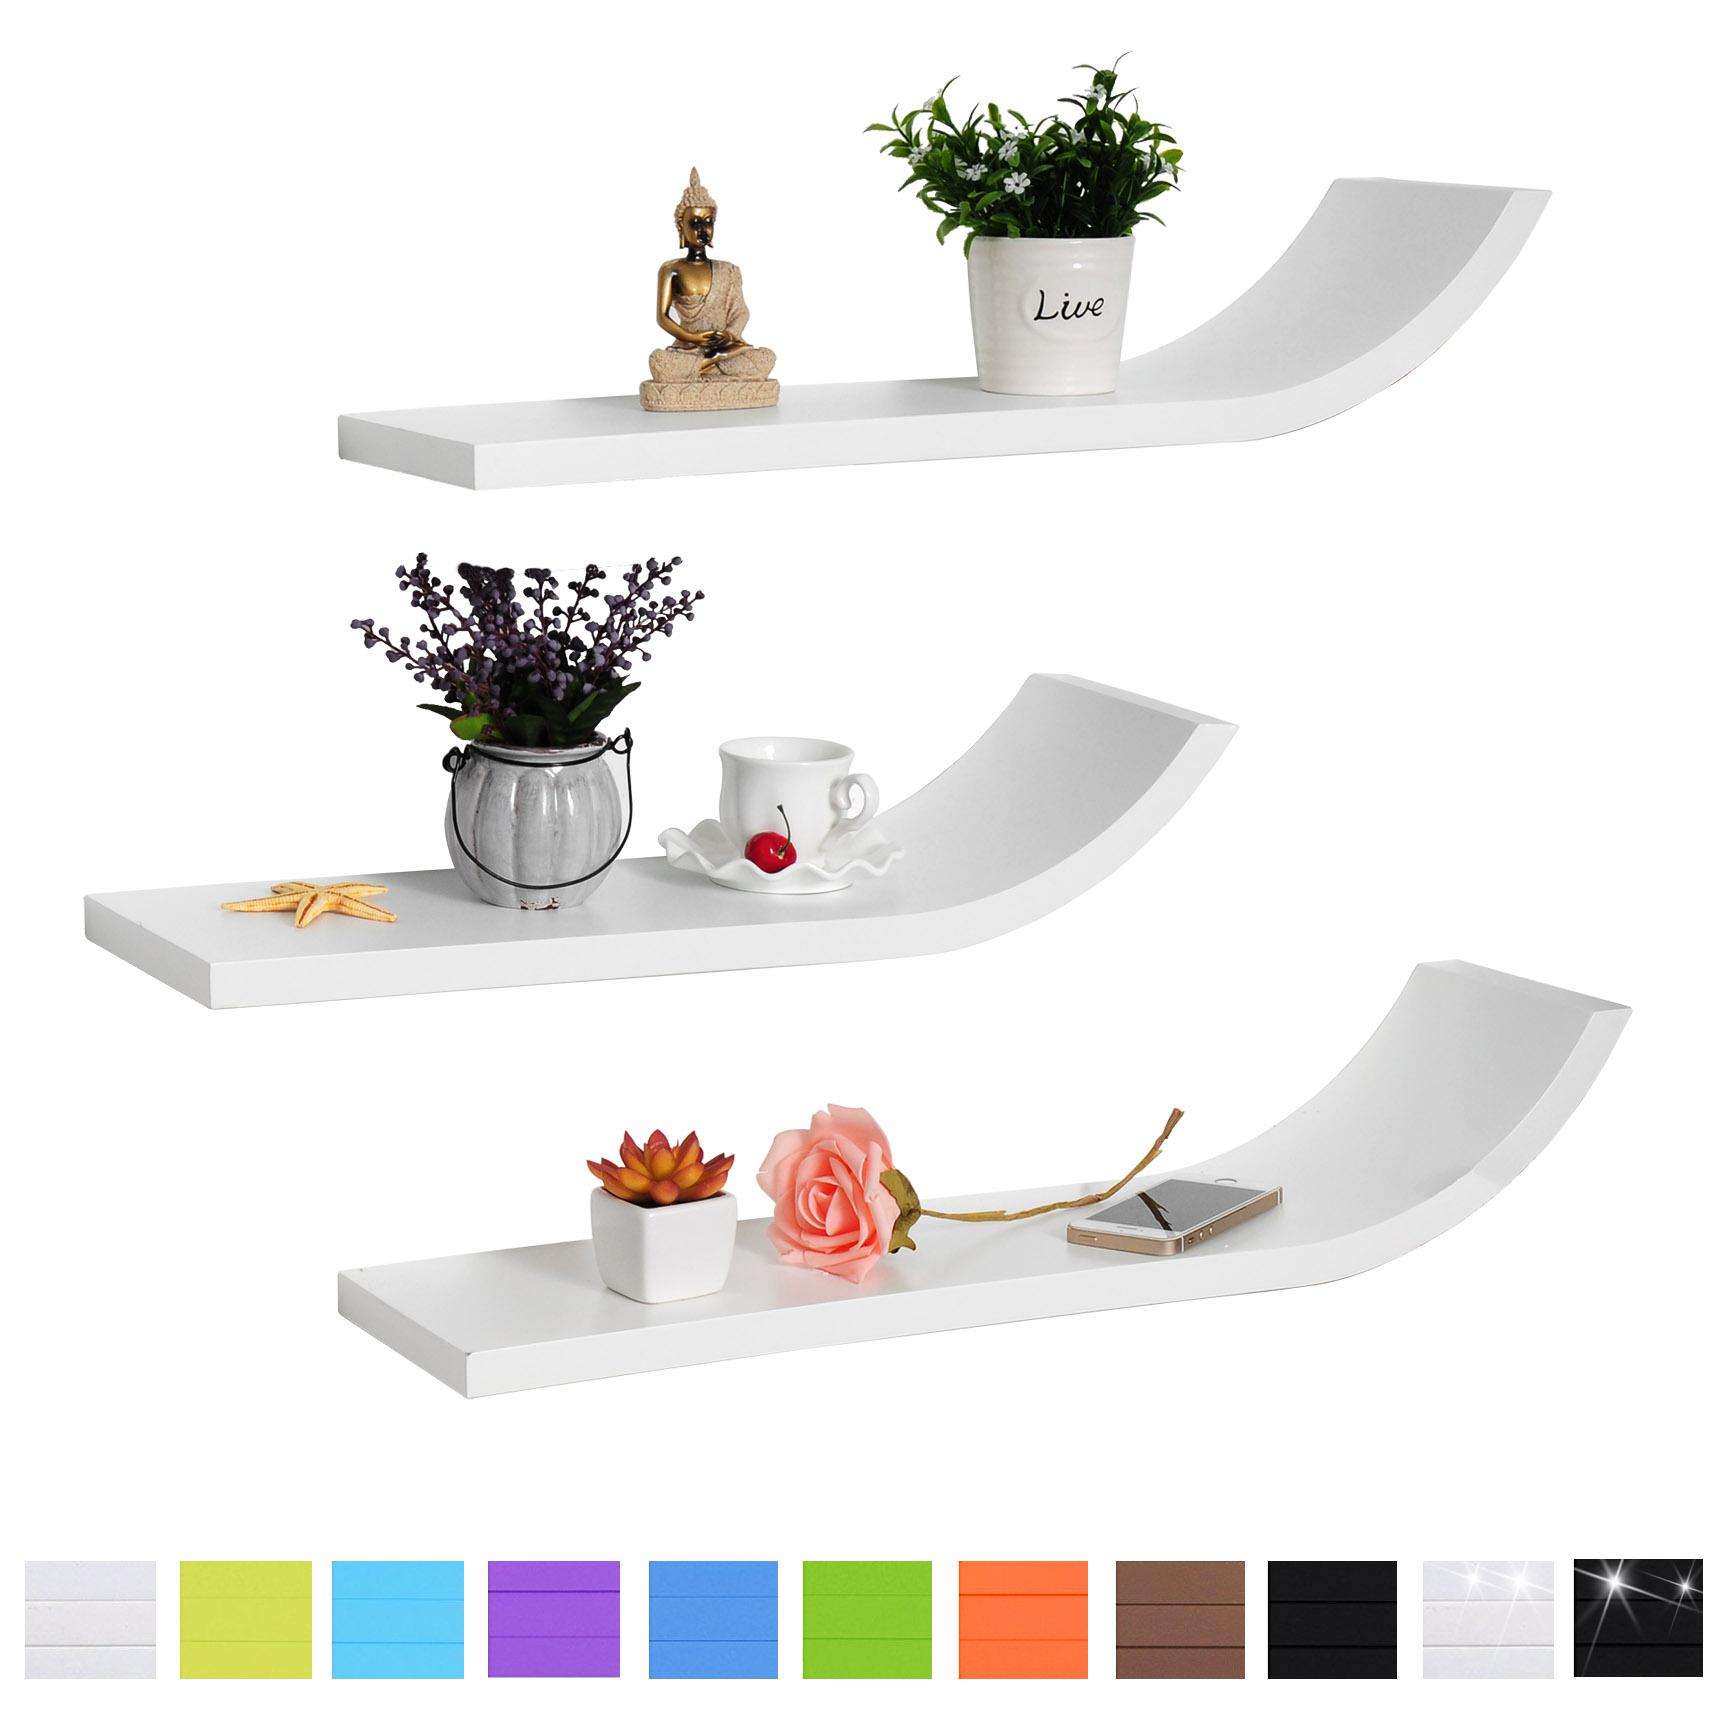 wandregal h ngeregal b cheregal cube cd regal 3er set. Black Bedroom Furniture Sets. Home Design Ideas